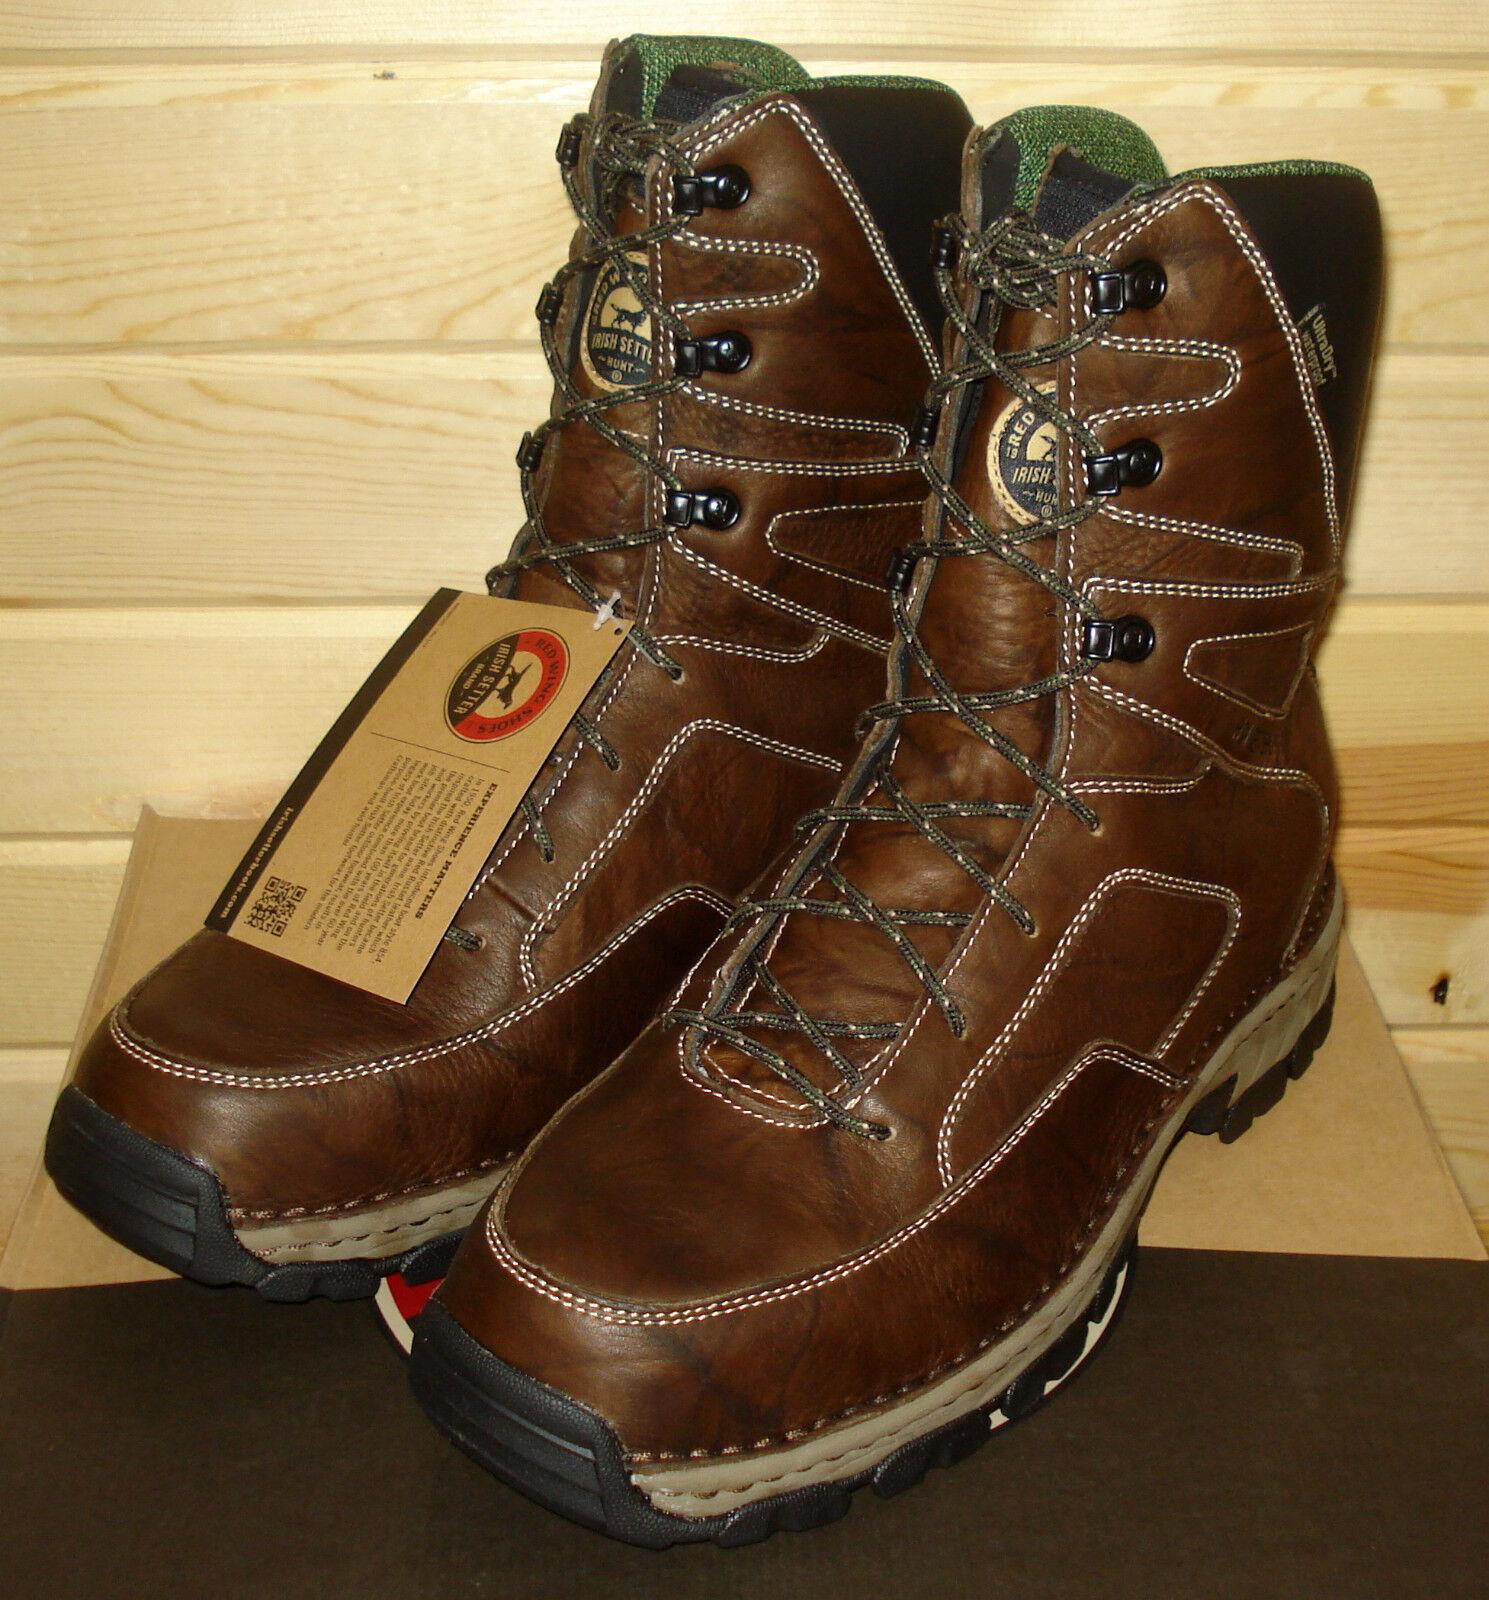 14 D rot WING IRISH SETTER HUNT HAVOC 810 mens 10  Waterproof Hunting Work Stiefel